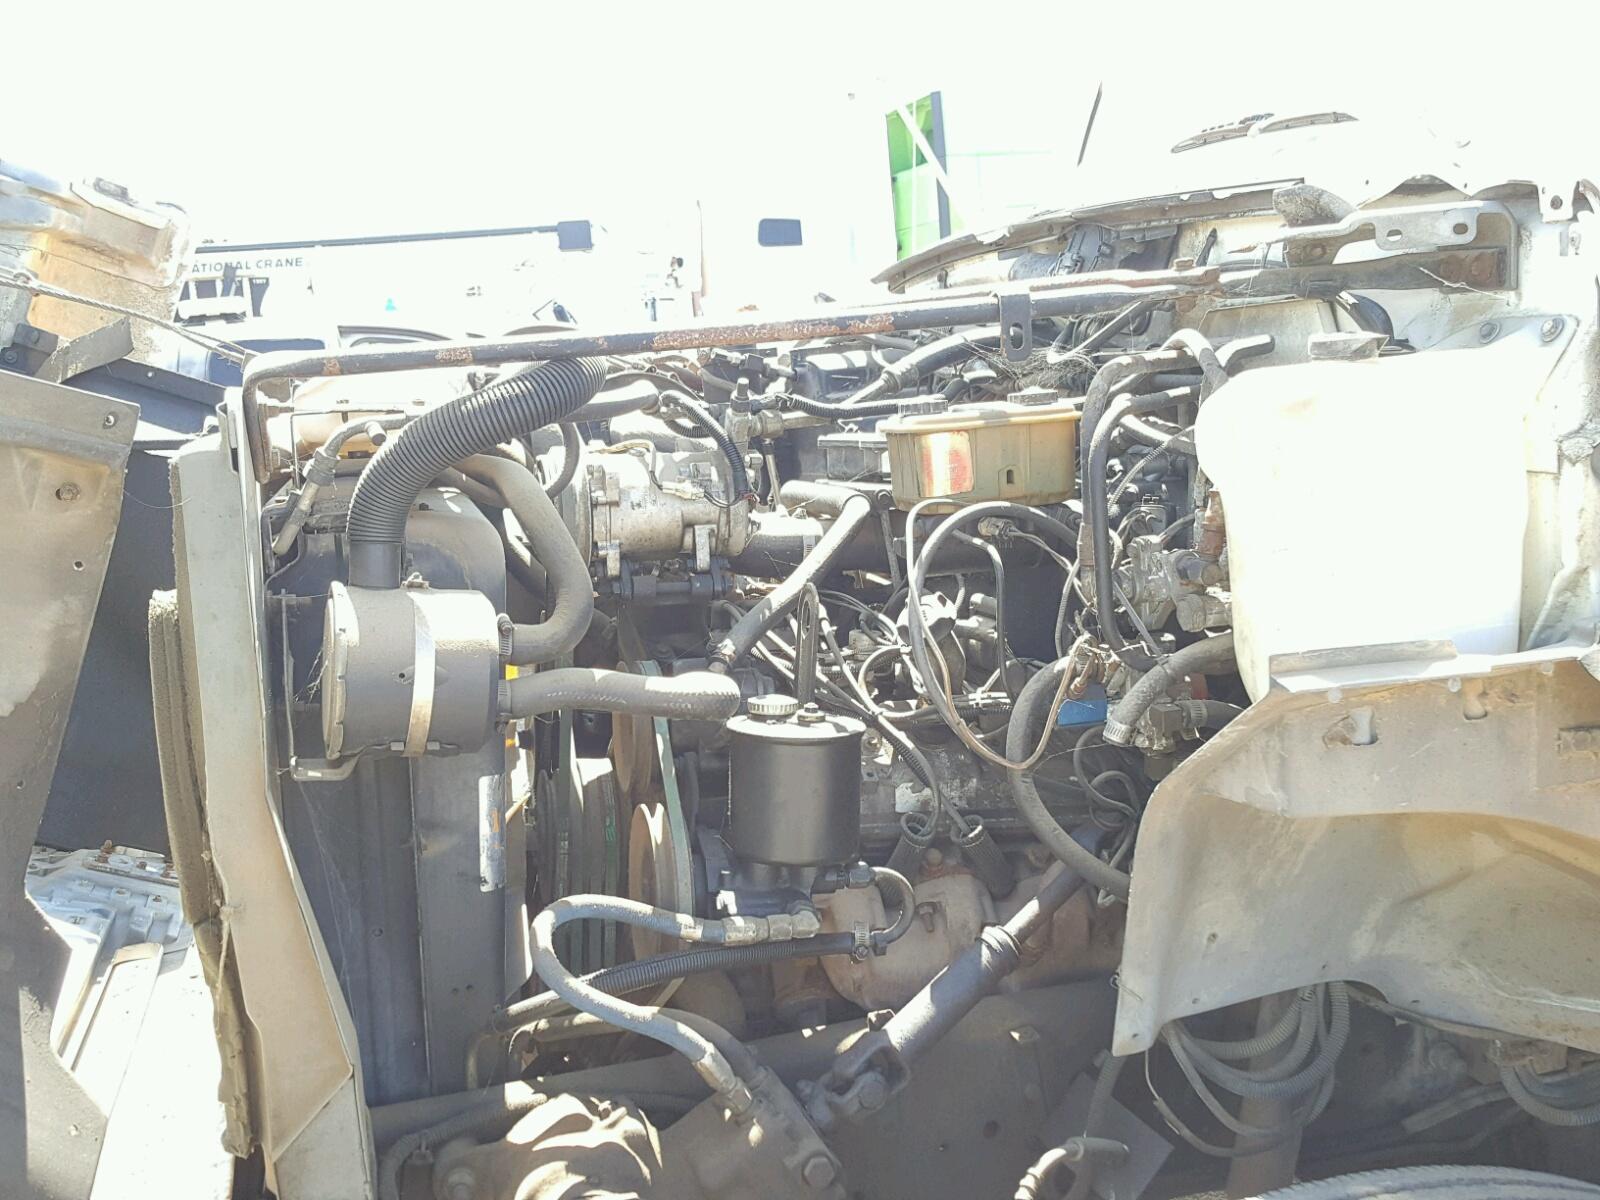 1fdpf70j0pva37752 1993 White Ford F700 On Sale In Tx Longview 1976 Dash Wiring 8 Inside View